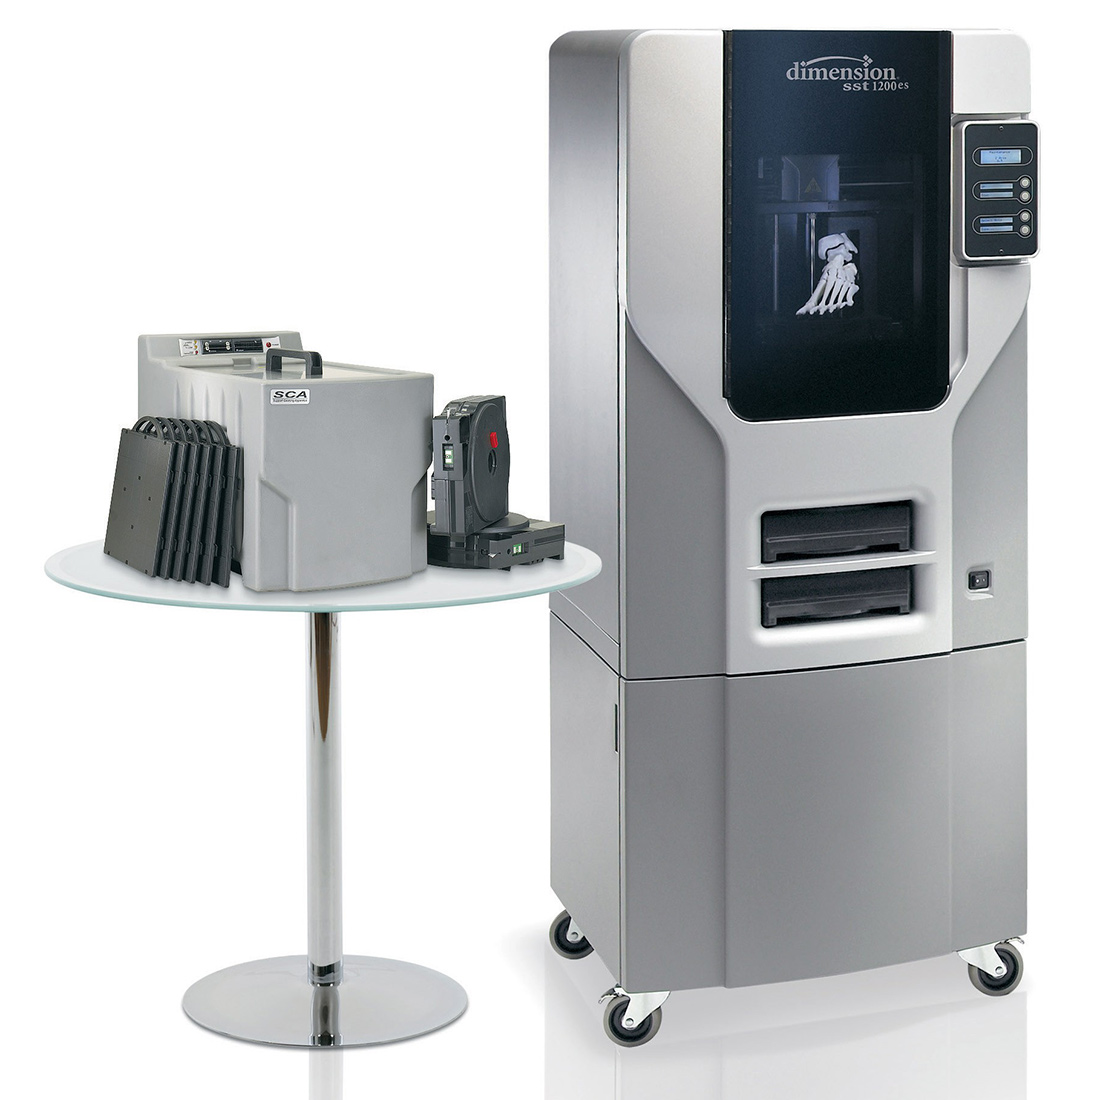 3D Printing Capabilities